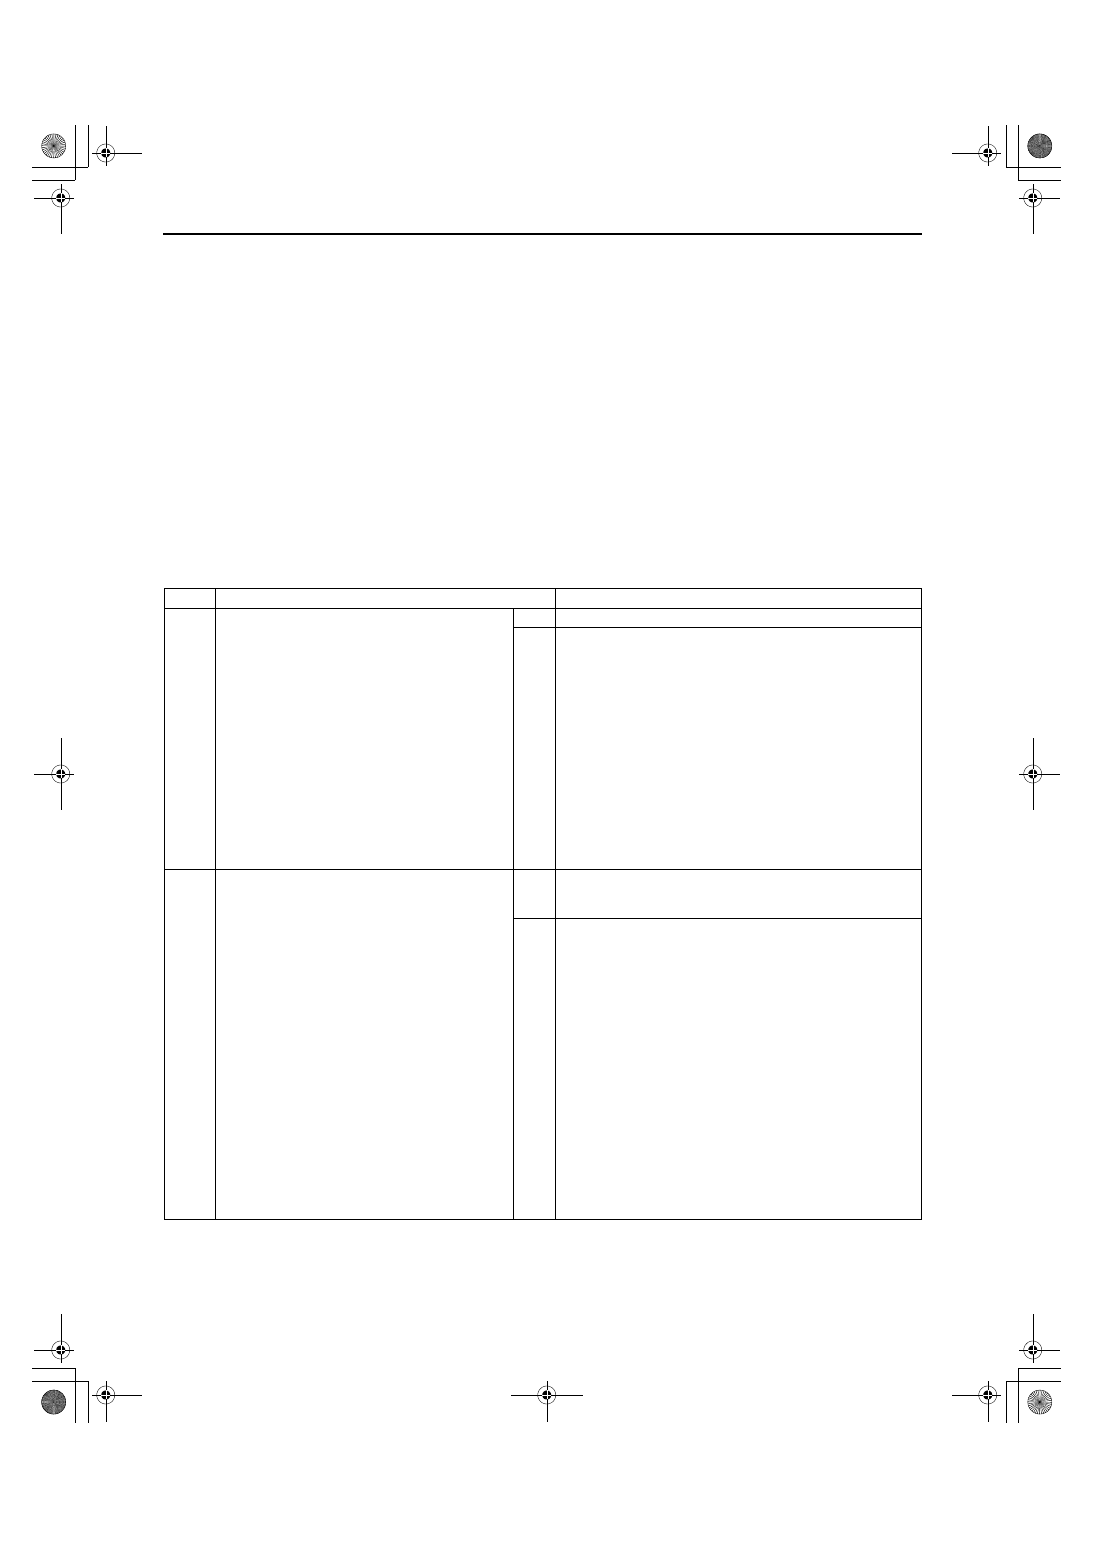 Mazda Cx 7 Manual Part 336 2007 Fuse Diagram